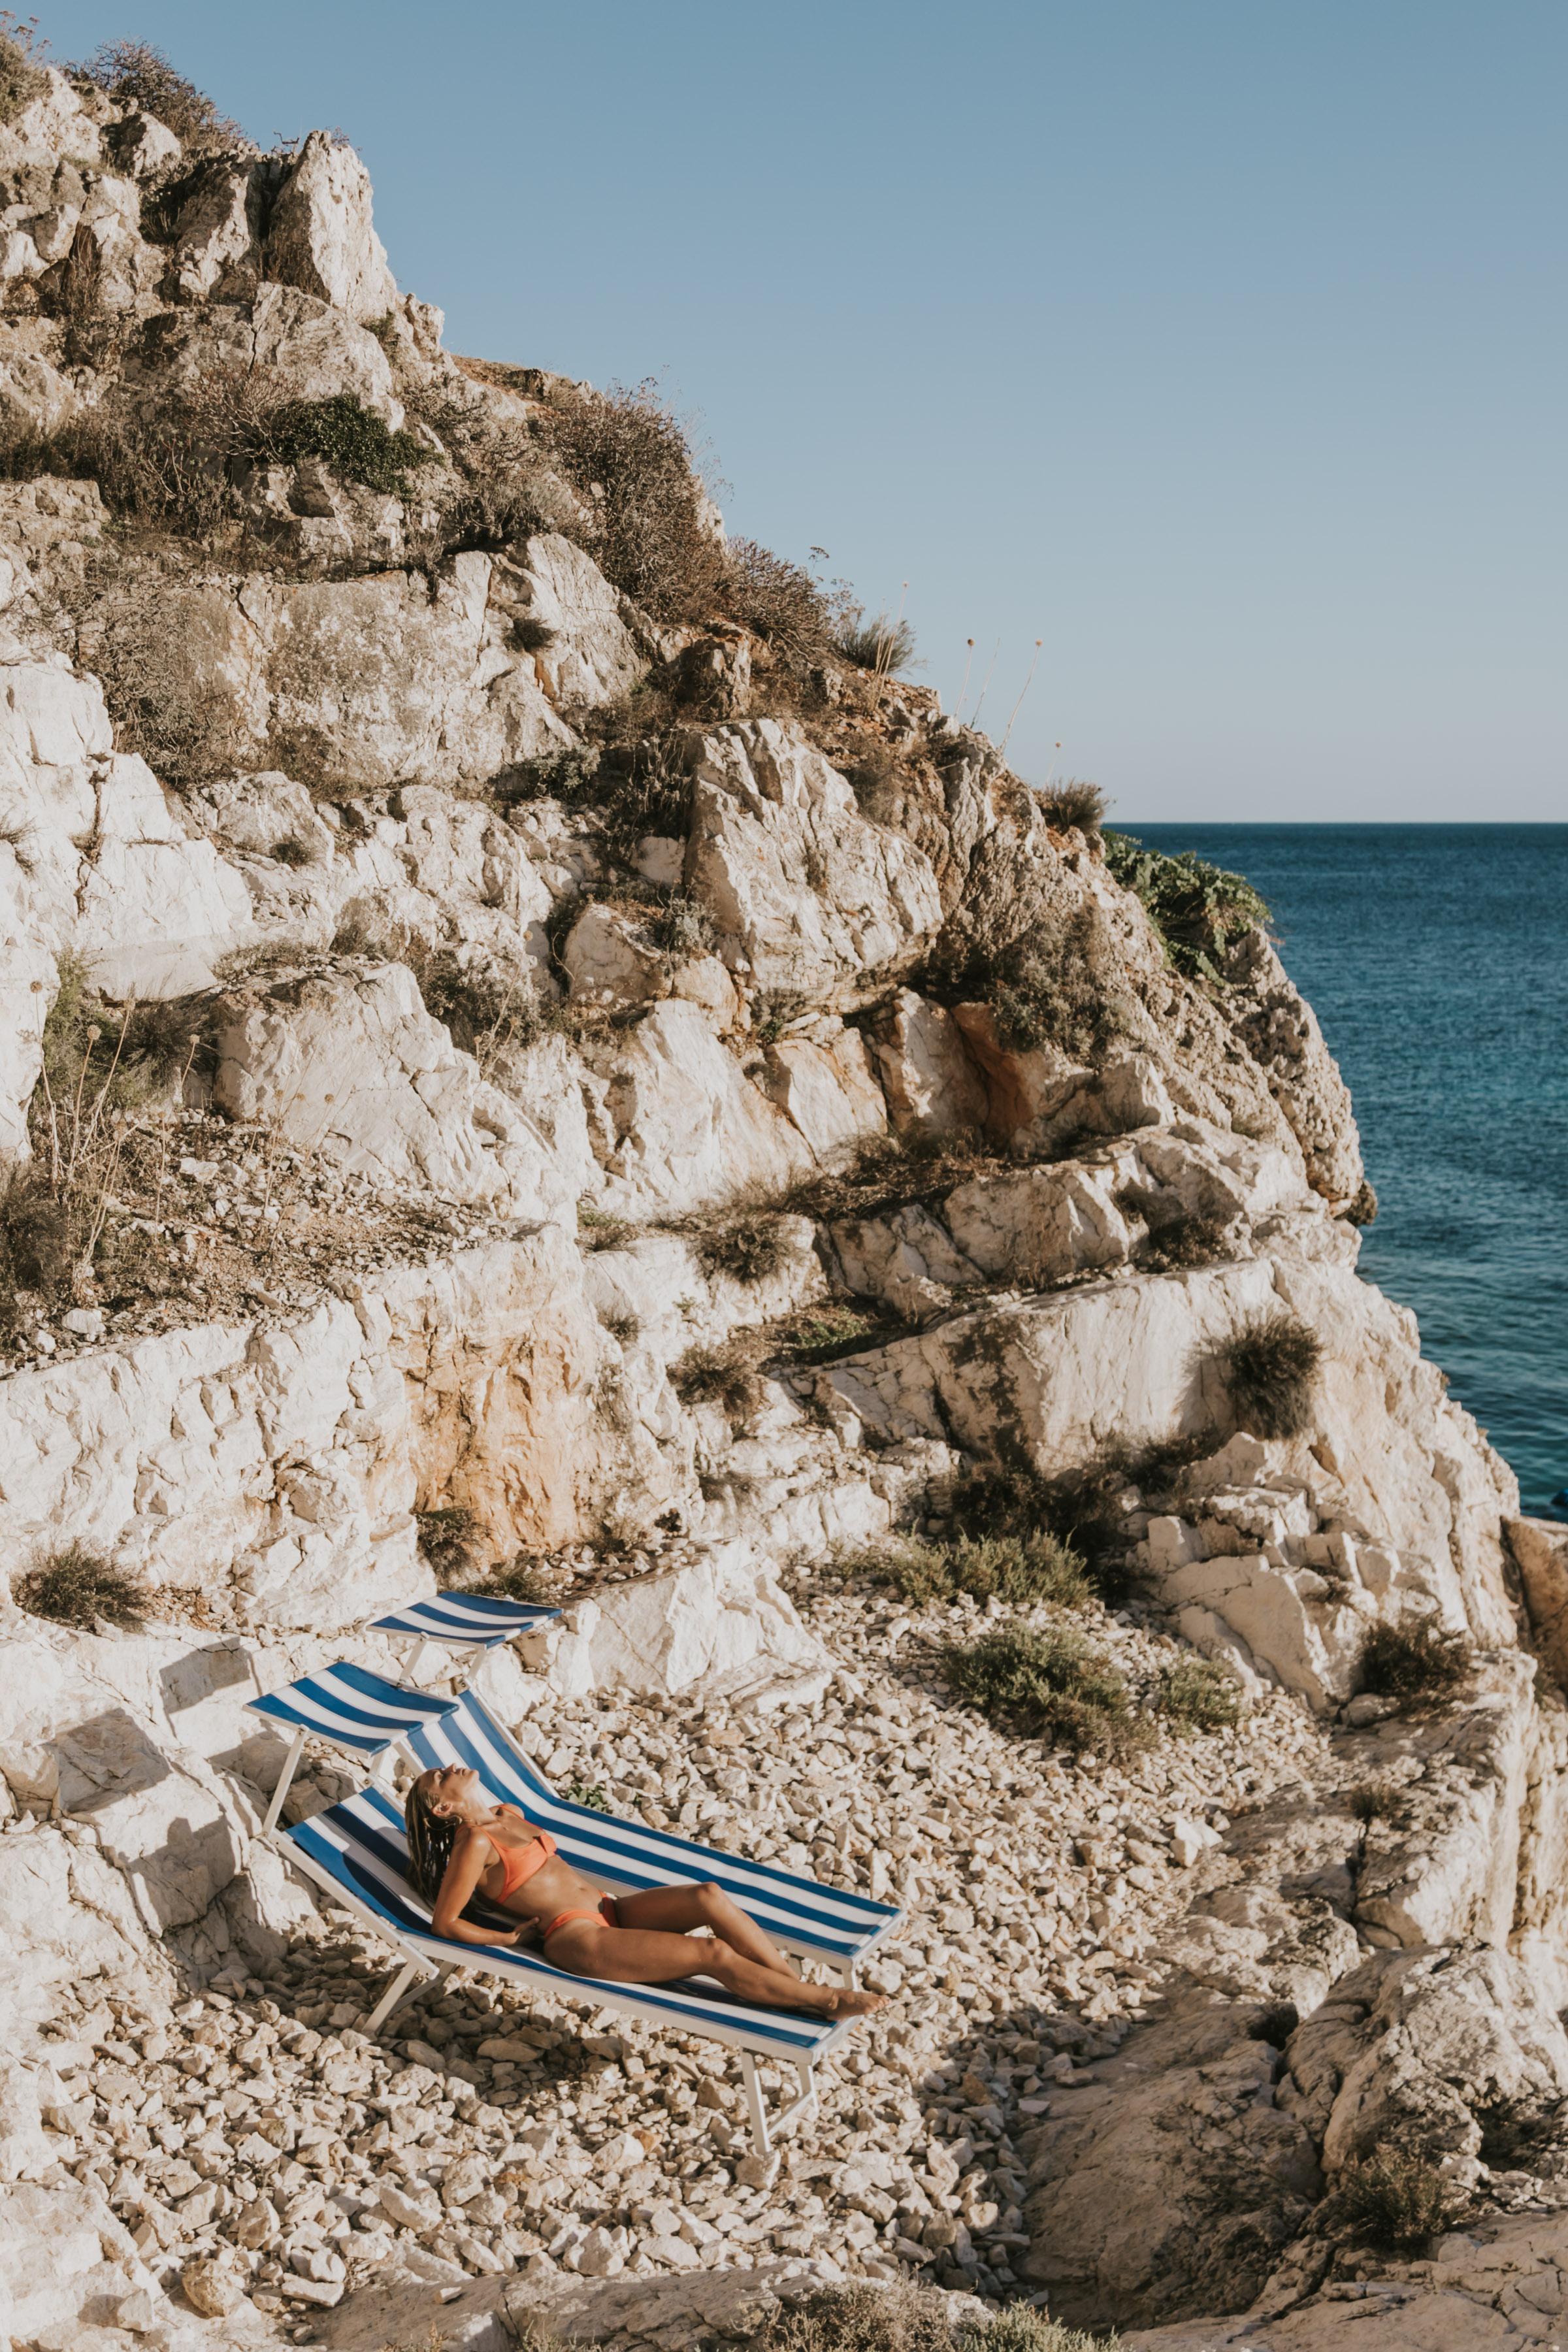 Sicily-AUG2018-CreditAllisonKuhlPhotos-4237.jpg